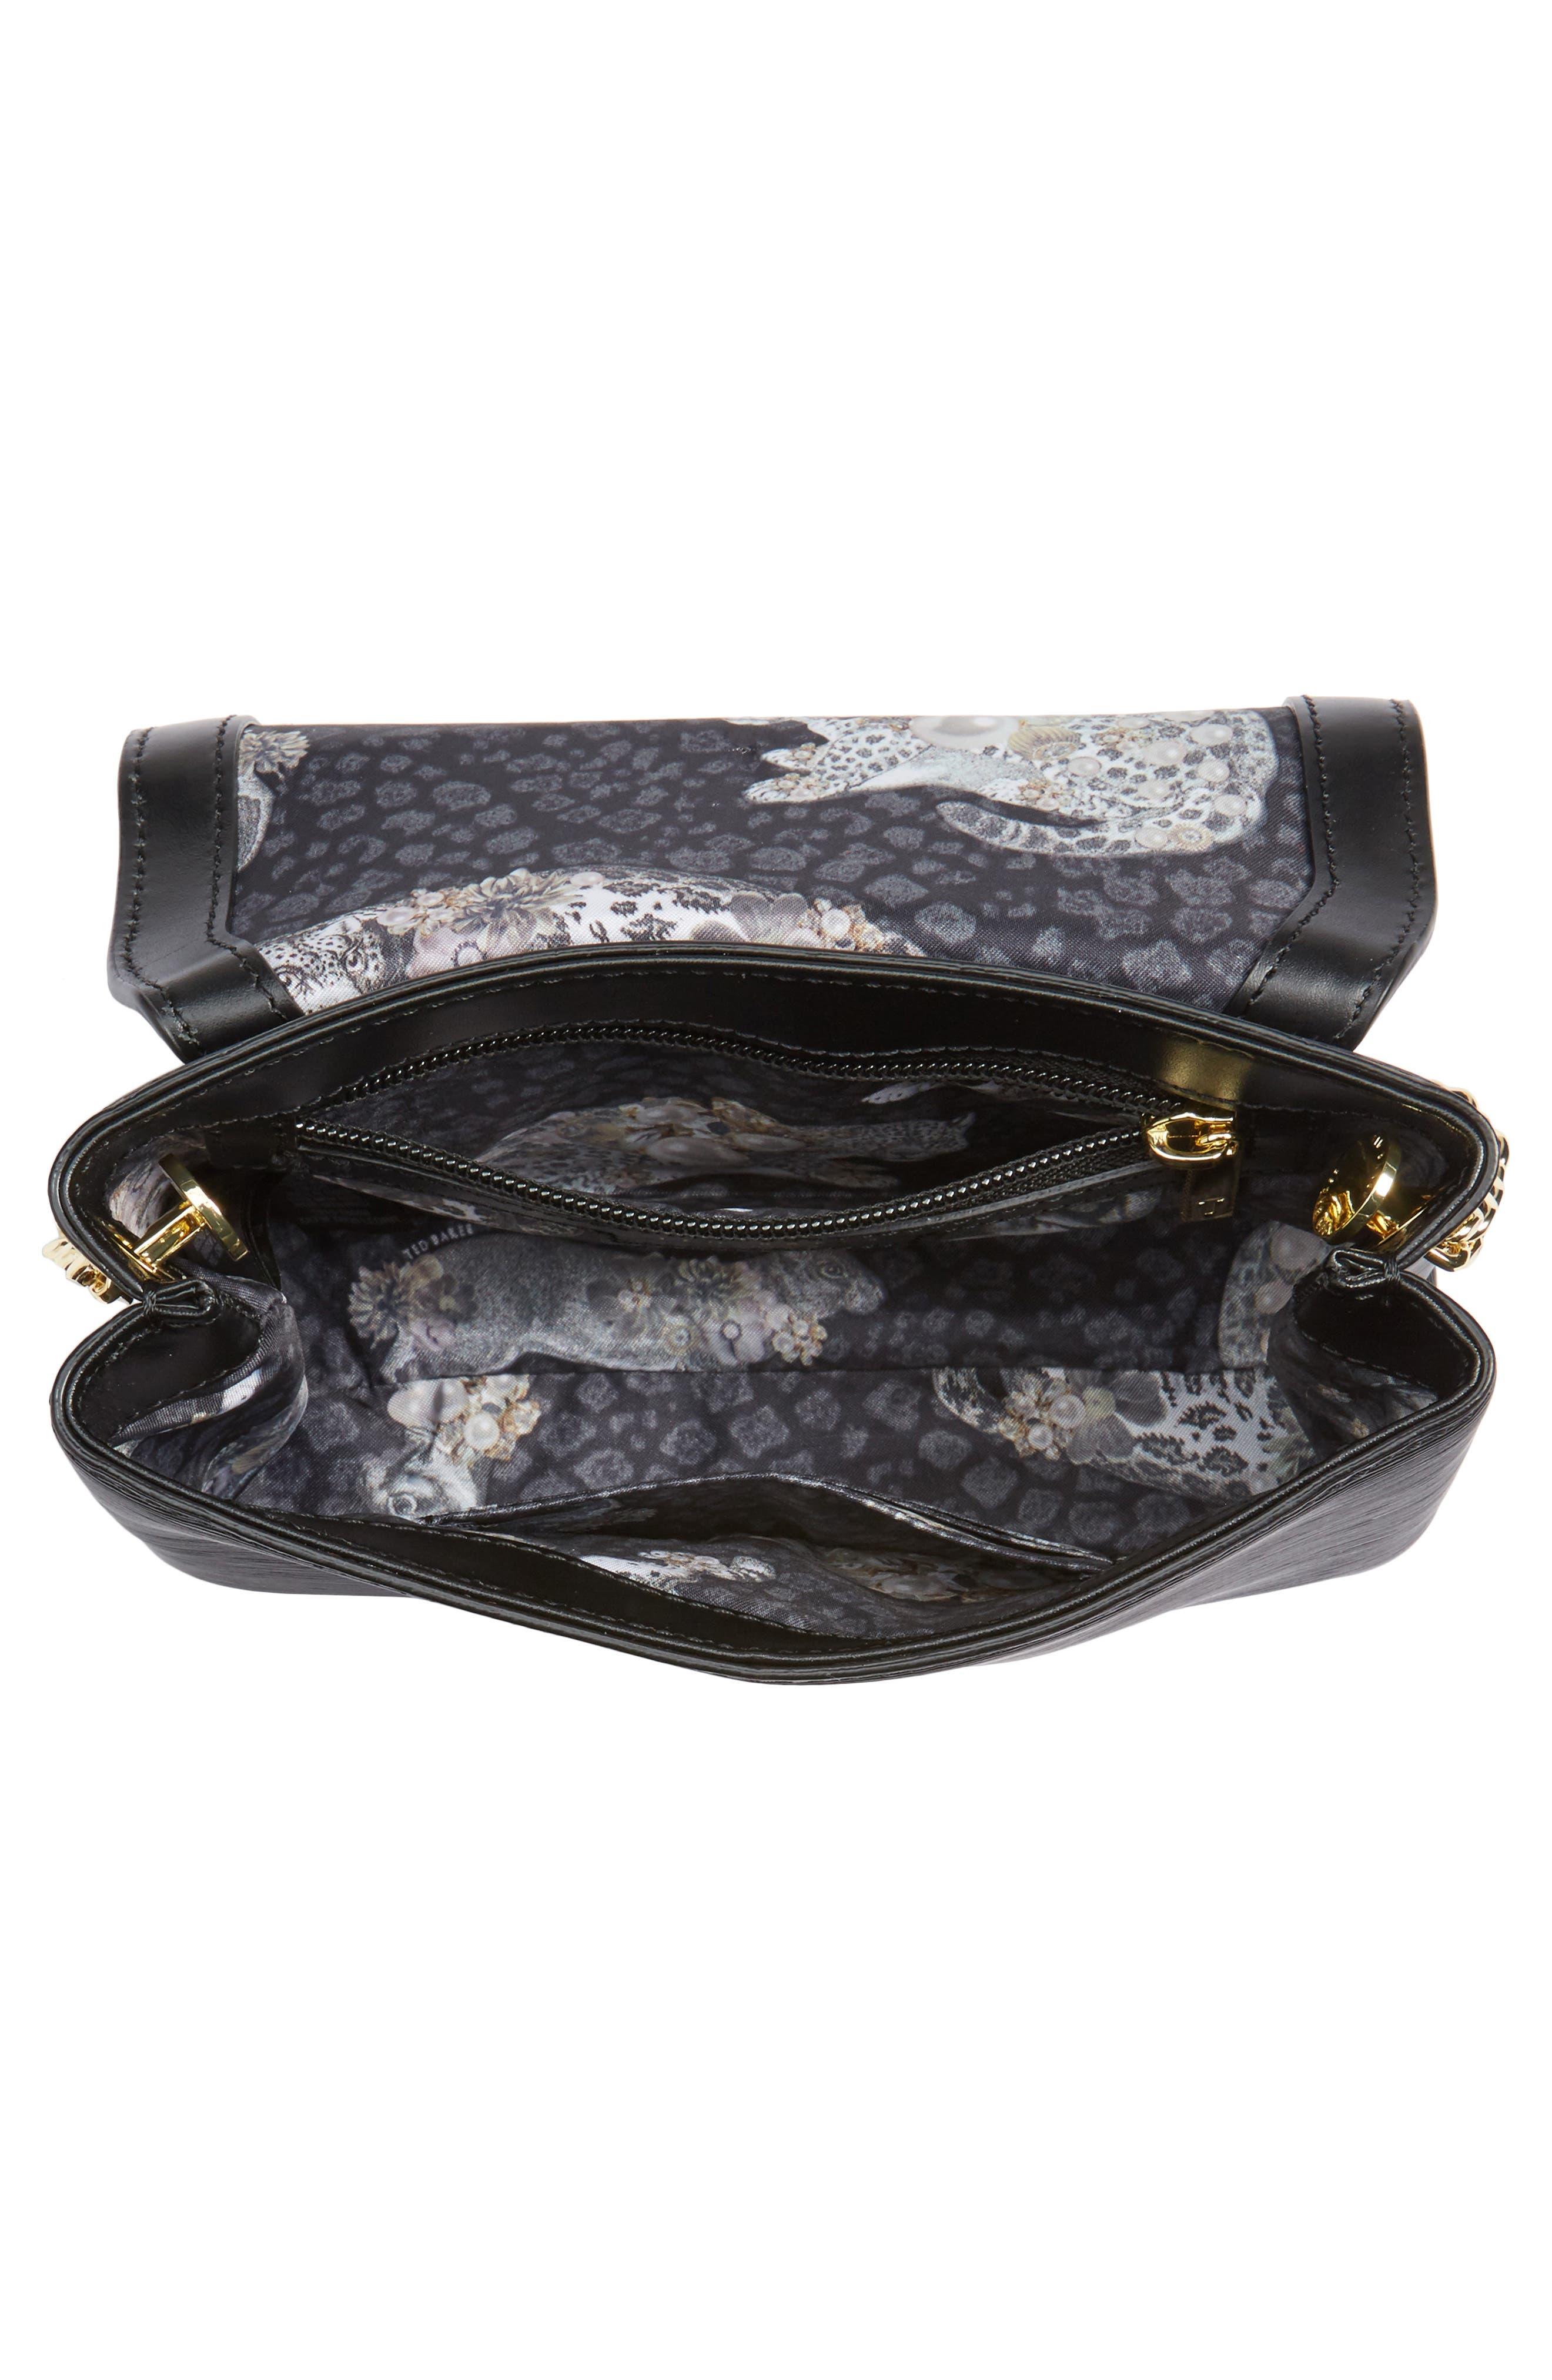 Leorr Bow Leather Crossbody Bag,                             Alternate thumbnail 4, color,                             001